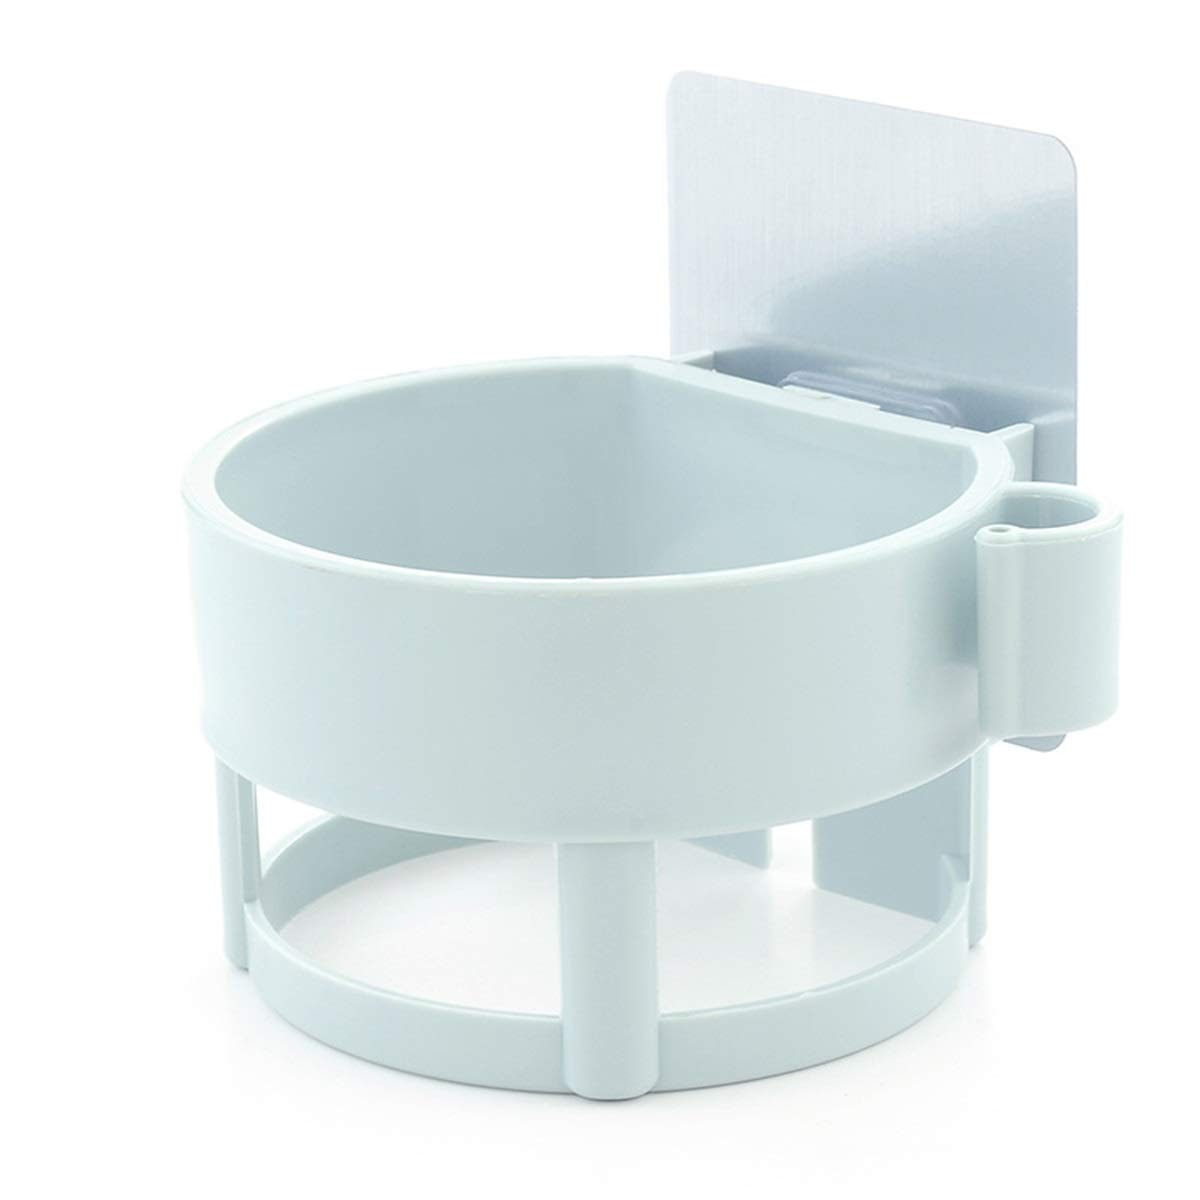 Hermoso soporte de pared para secador de pelo ABS sin taladros para el hogar ba/ño hotel color azul